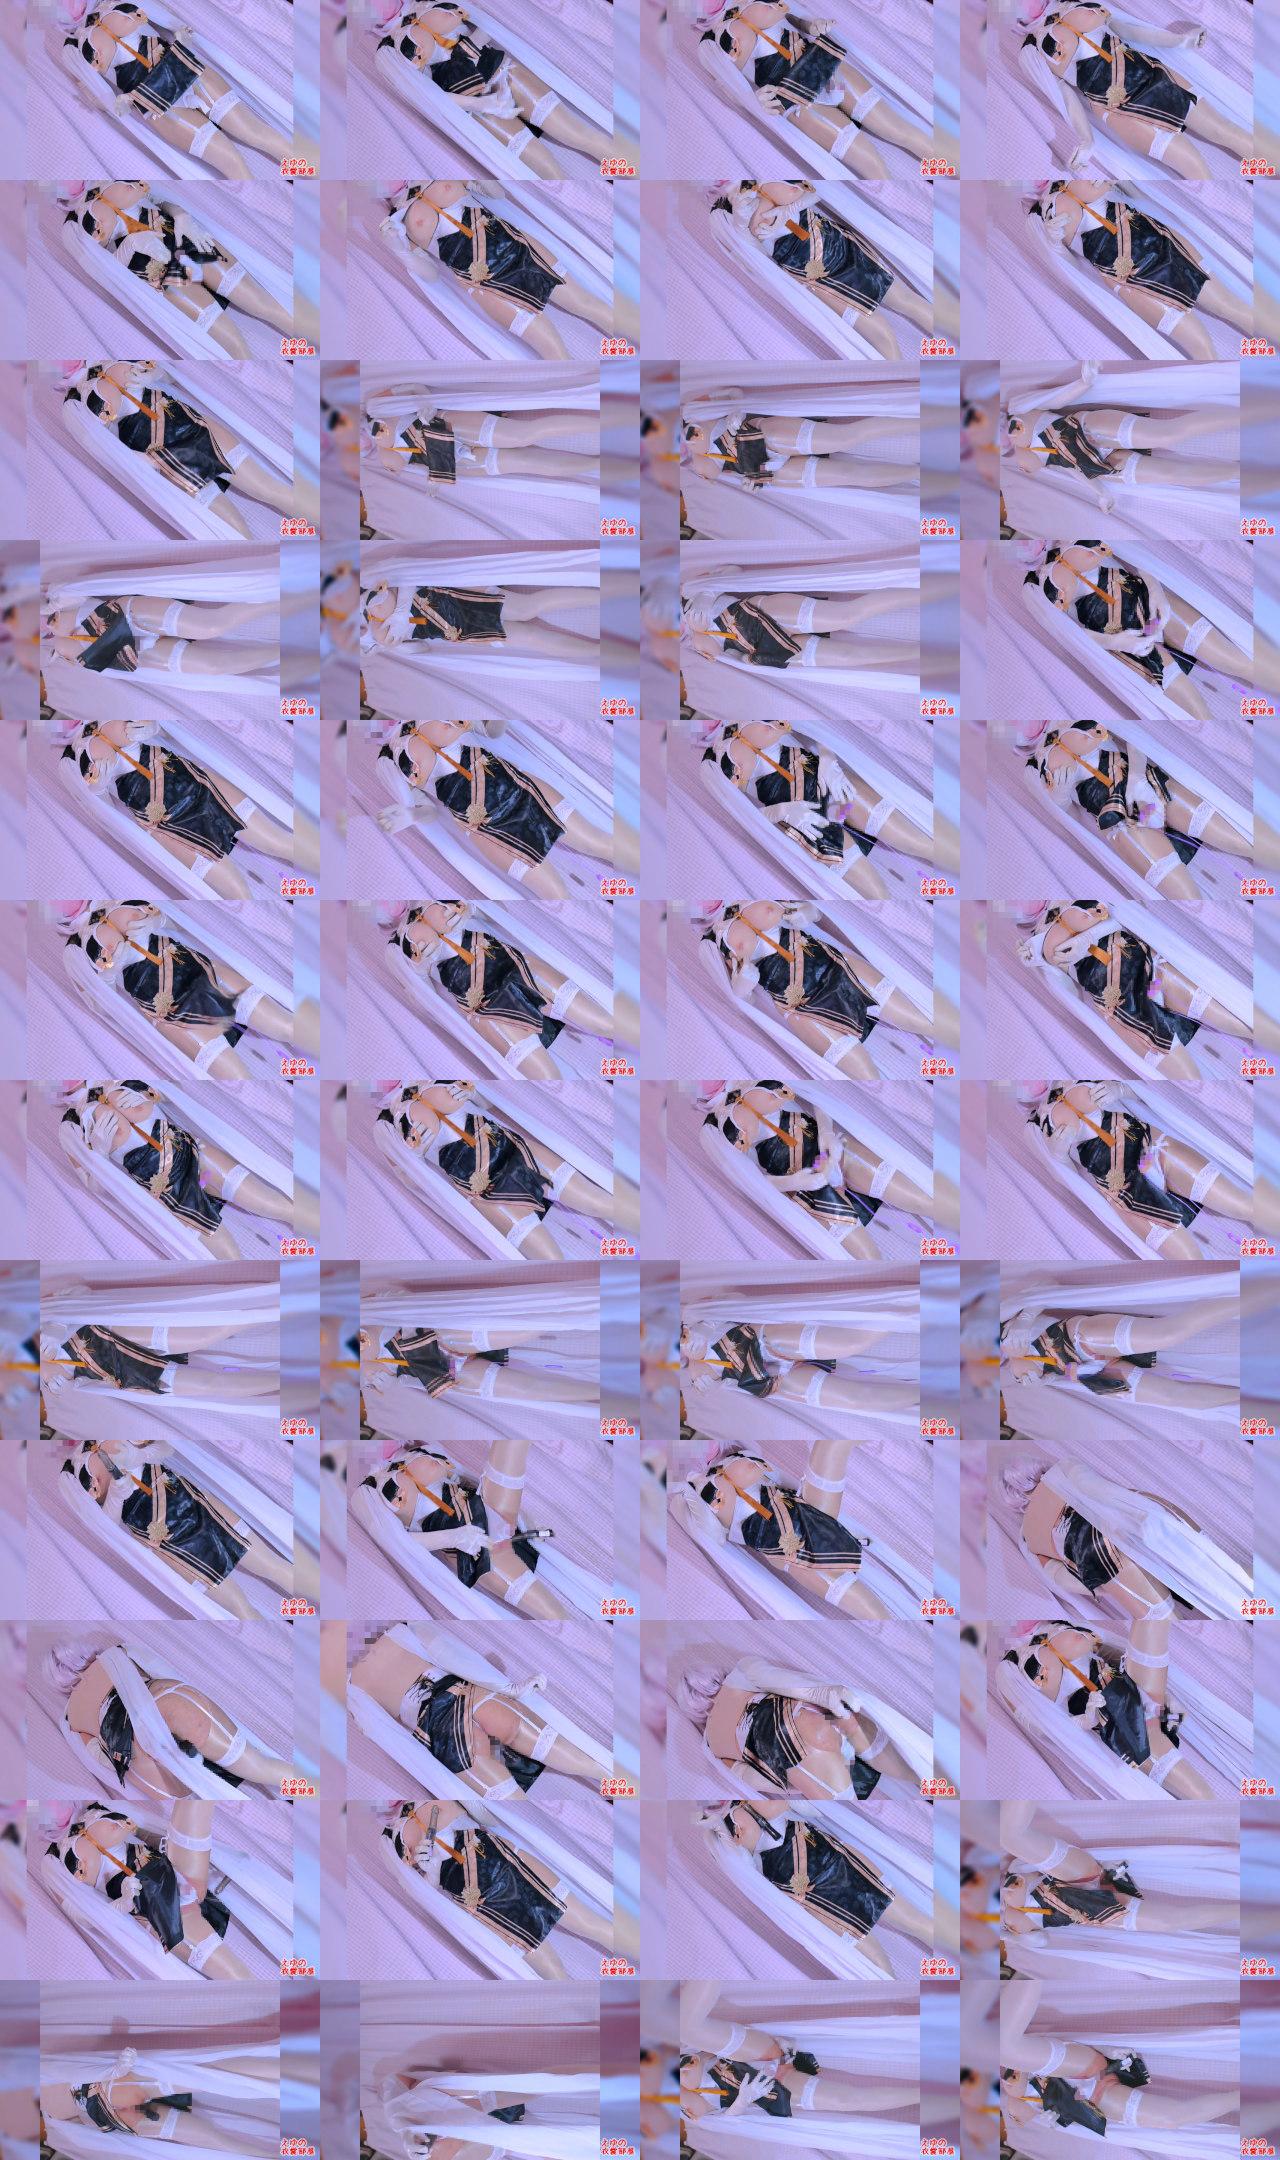 Gカップ巨乳男の娘おちんちんフリフリ・ディルドオナニー [アズー〇レーン・シリ〇ス]のサンプル画像2